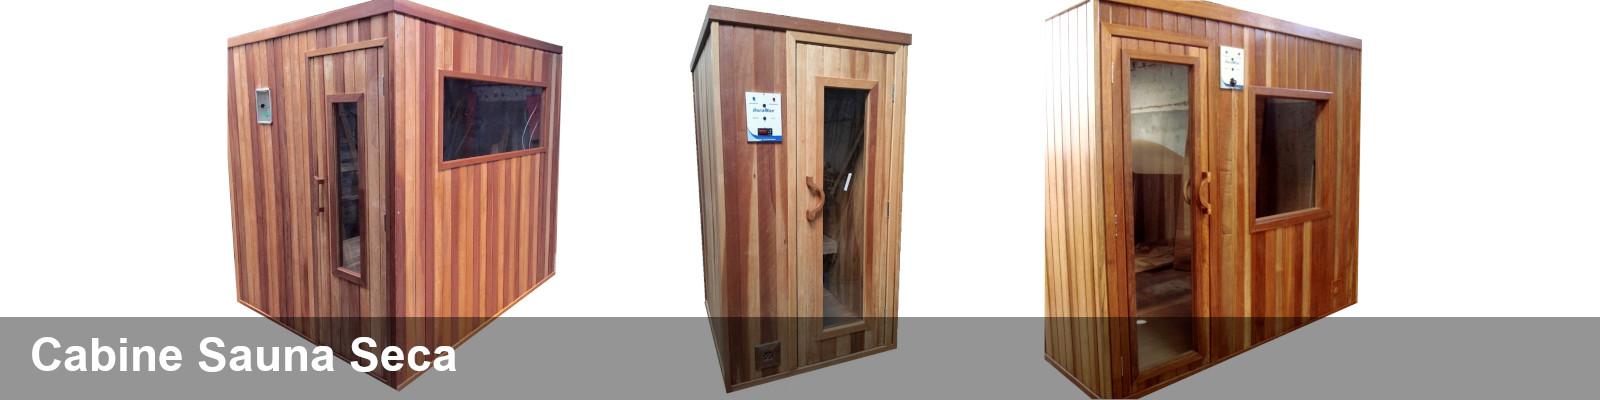 Cabines de Sauna Seca